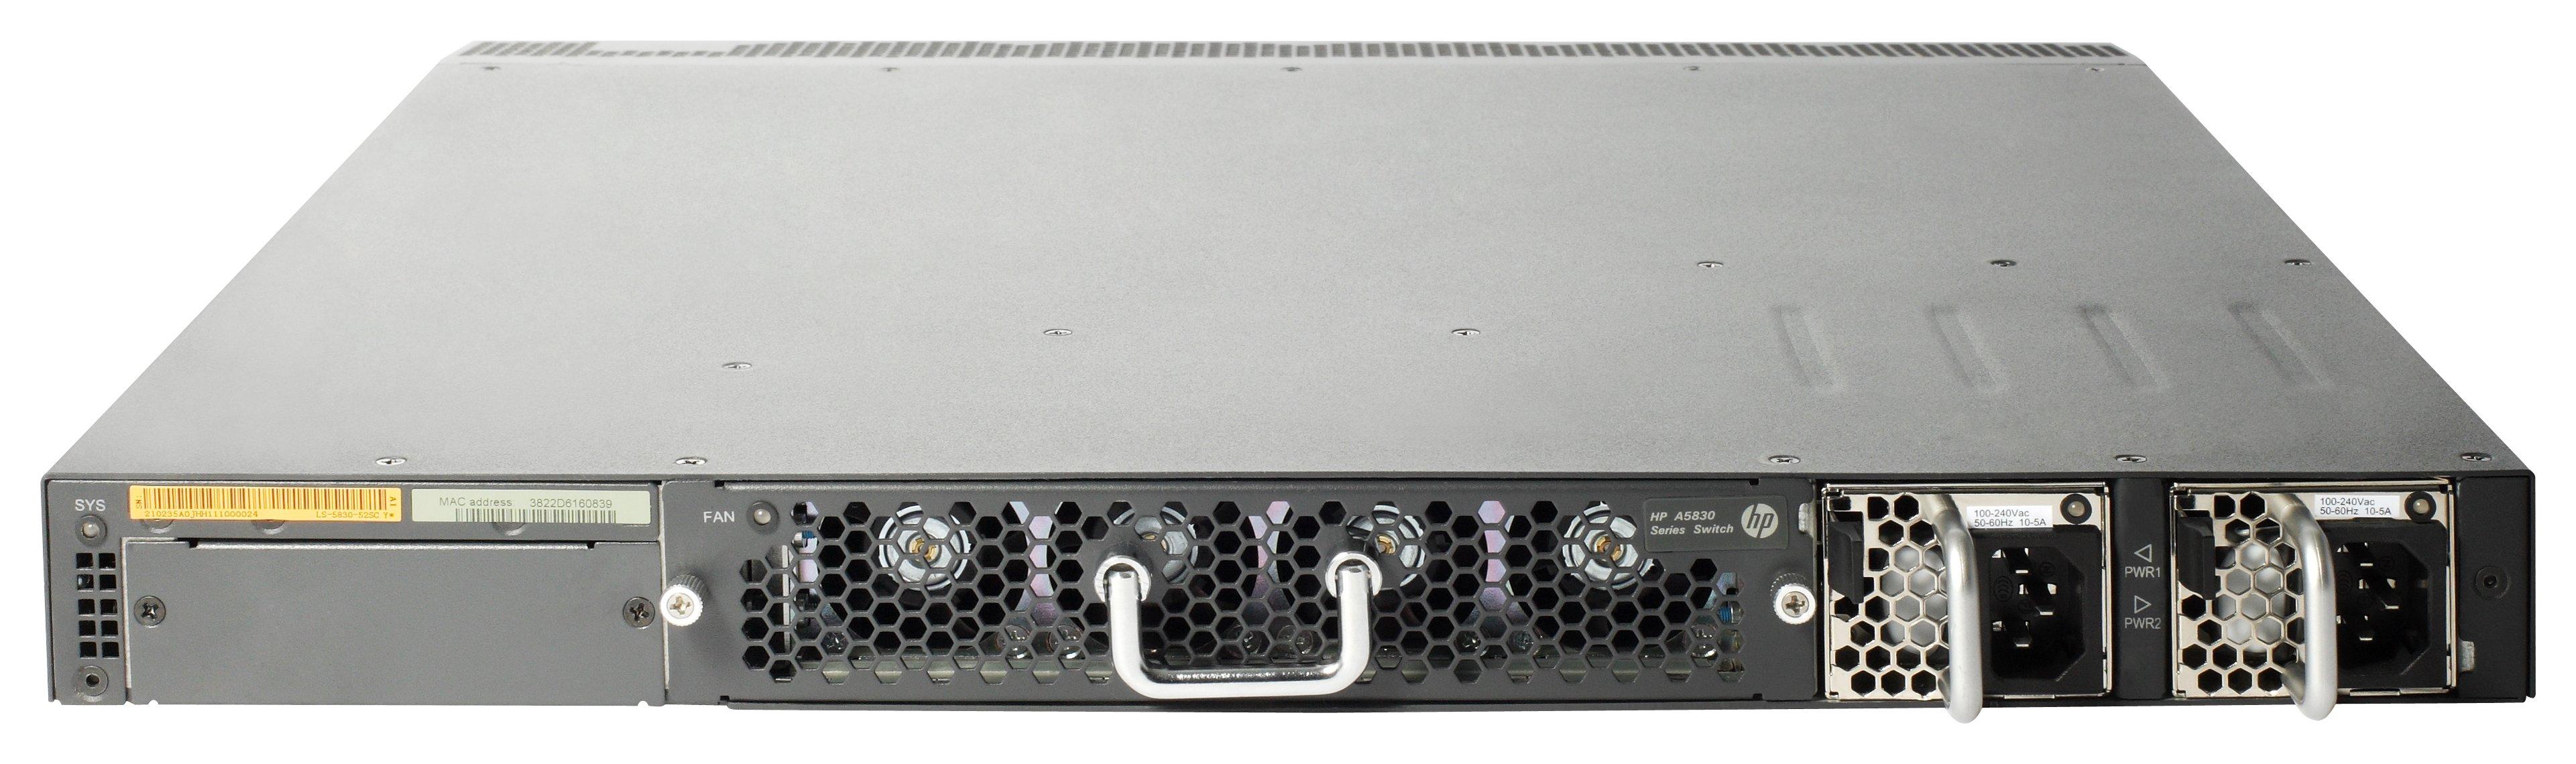 HPE JC691A - HPE Hewlett Packard Enterprise A 5830AF-48G L2 Black 1U